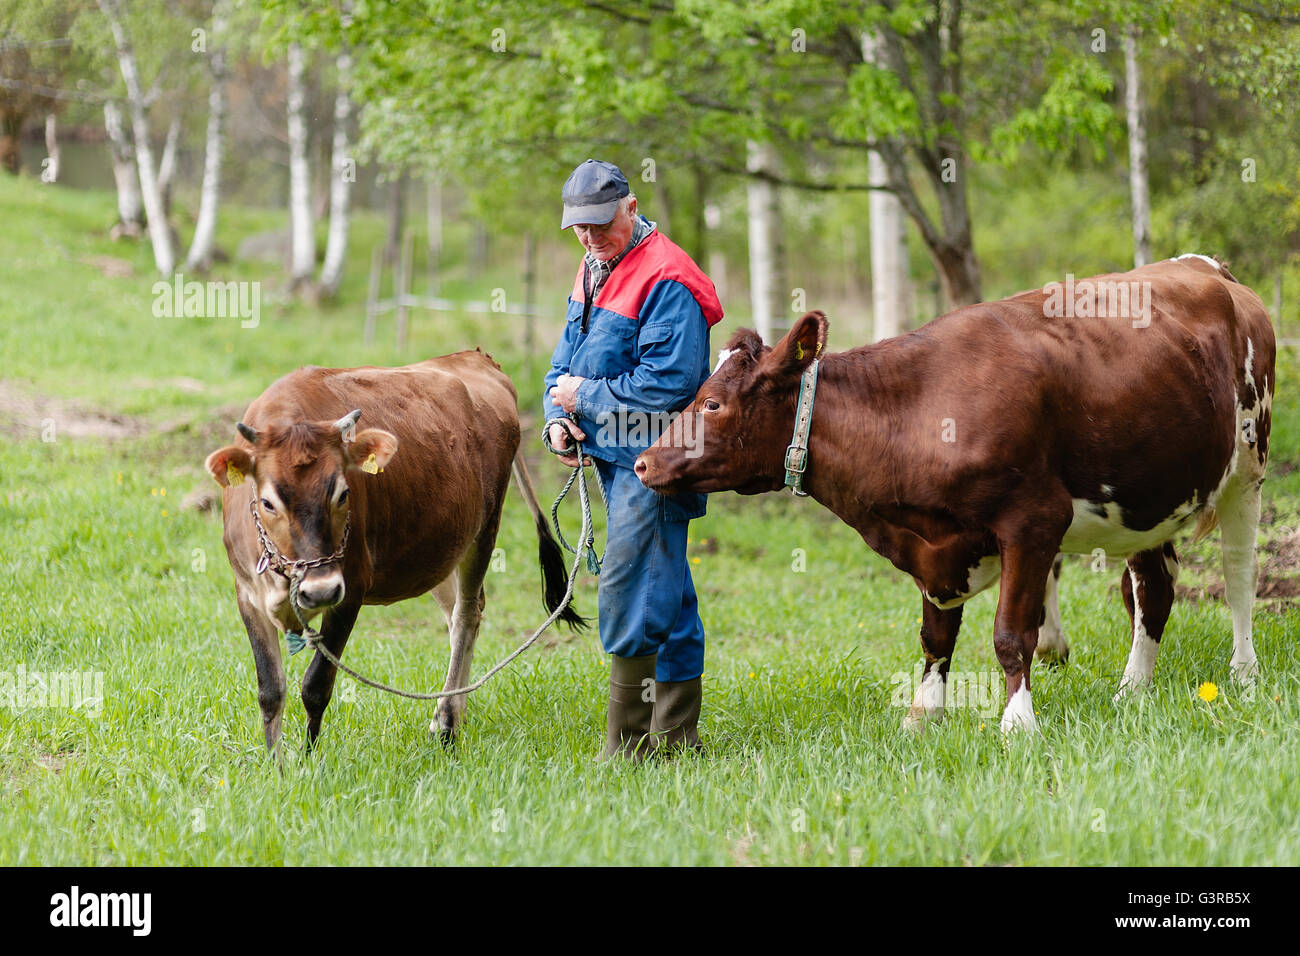 Sweden, Vastmanland, Bergslagen, Hallefors, Senior farmer standing with cows (Bos taurus) in field - Stock Image